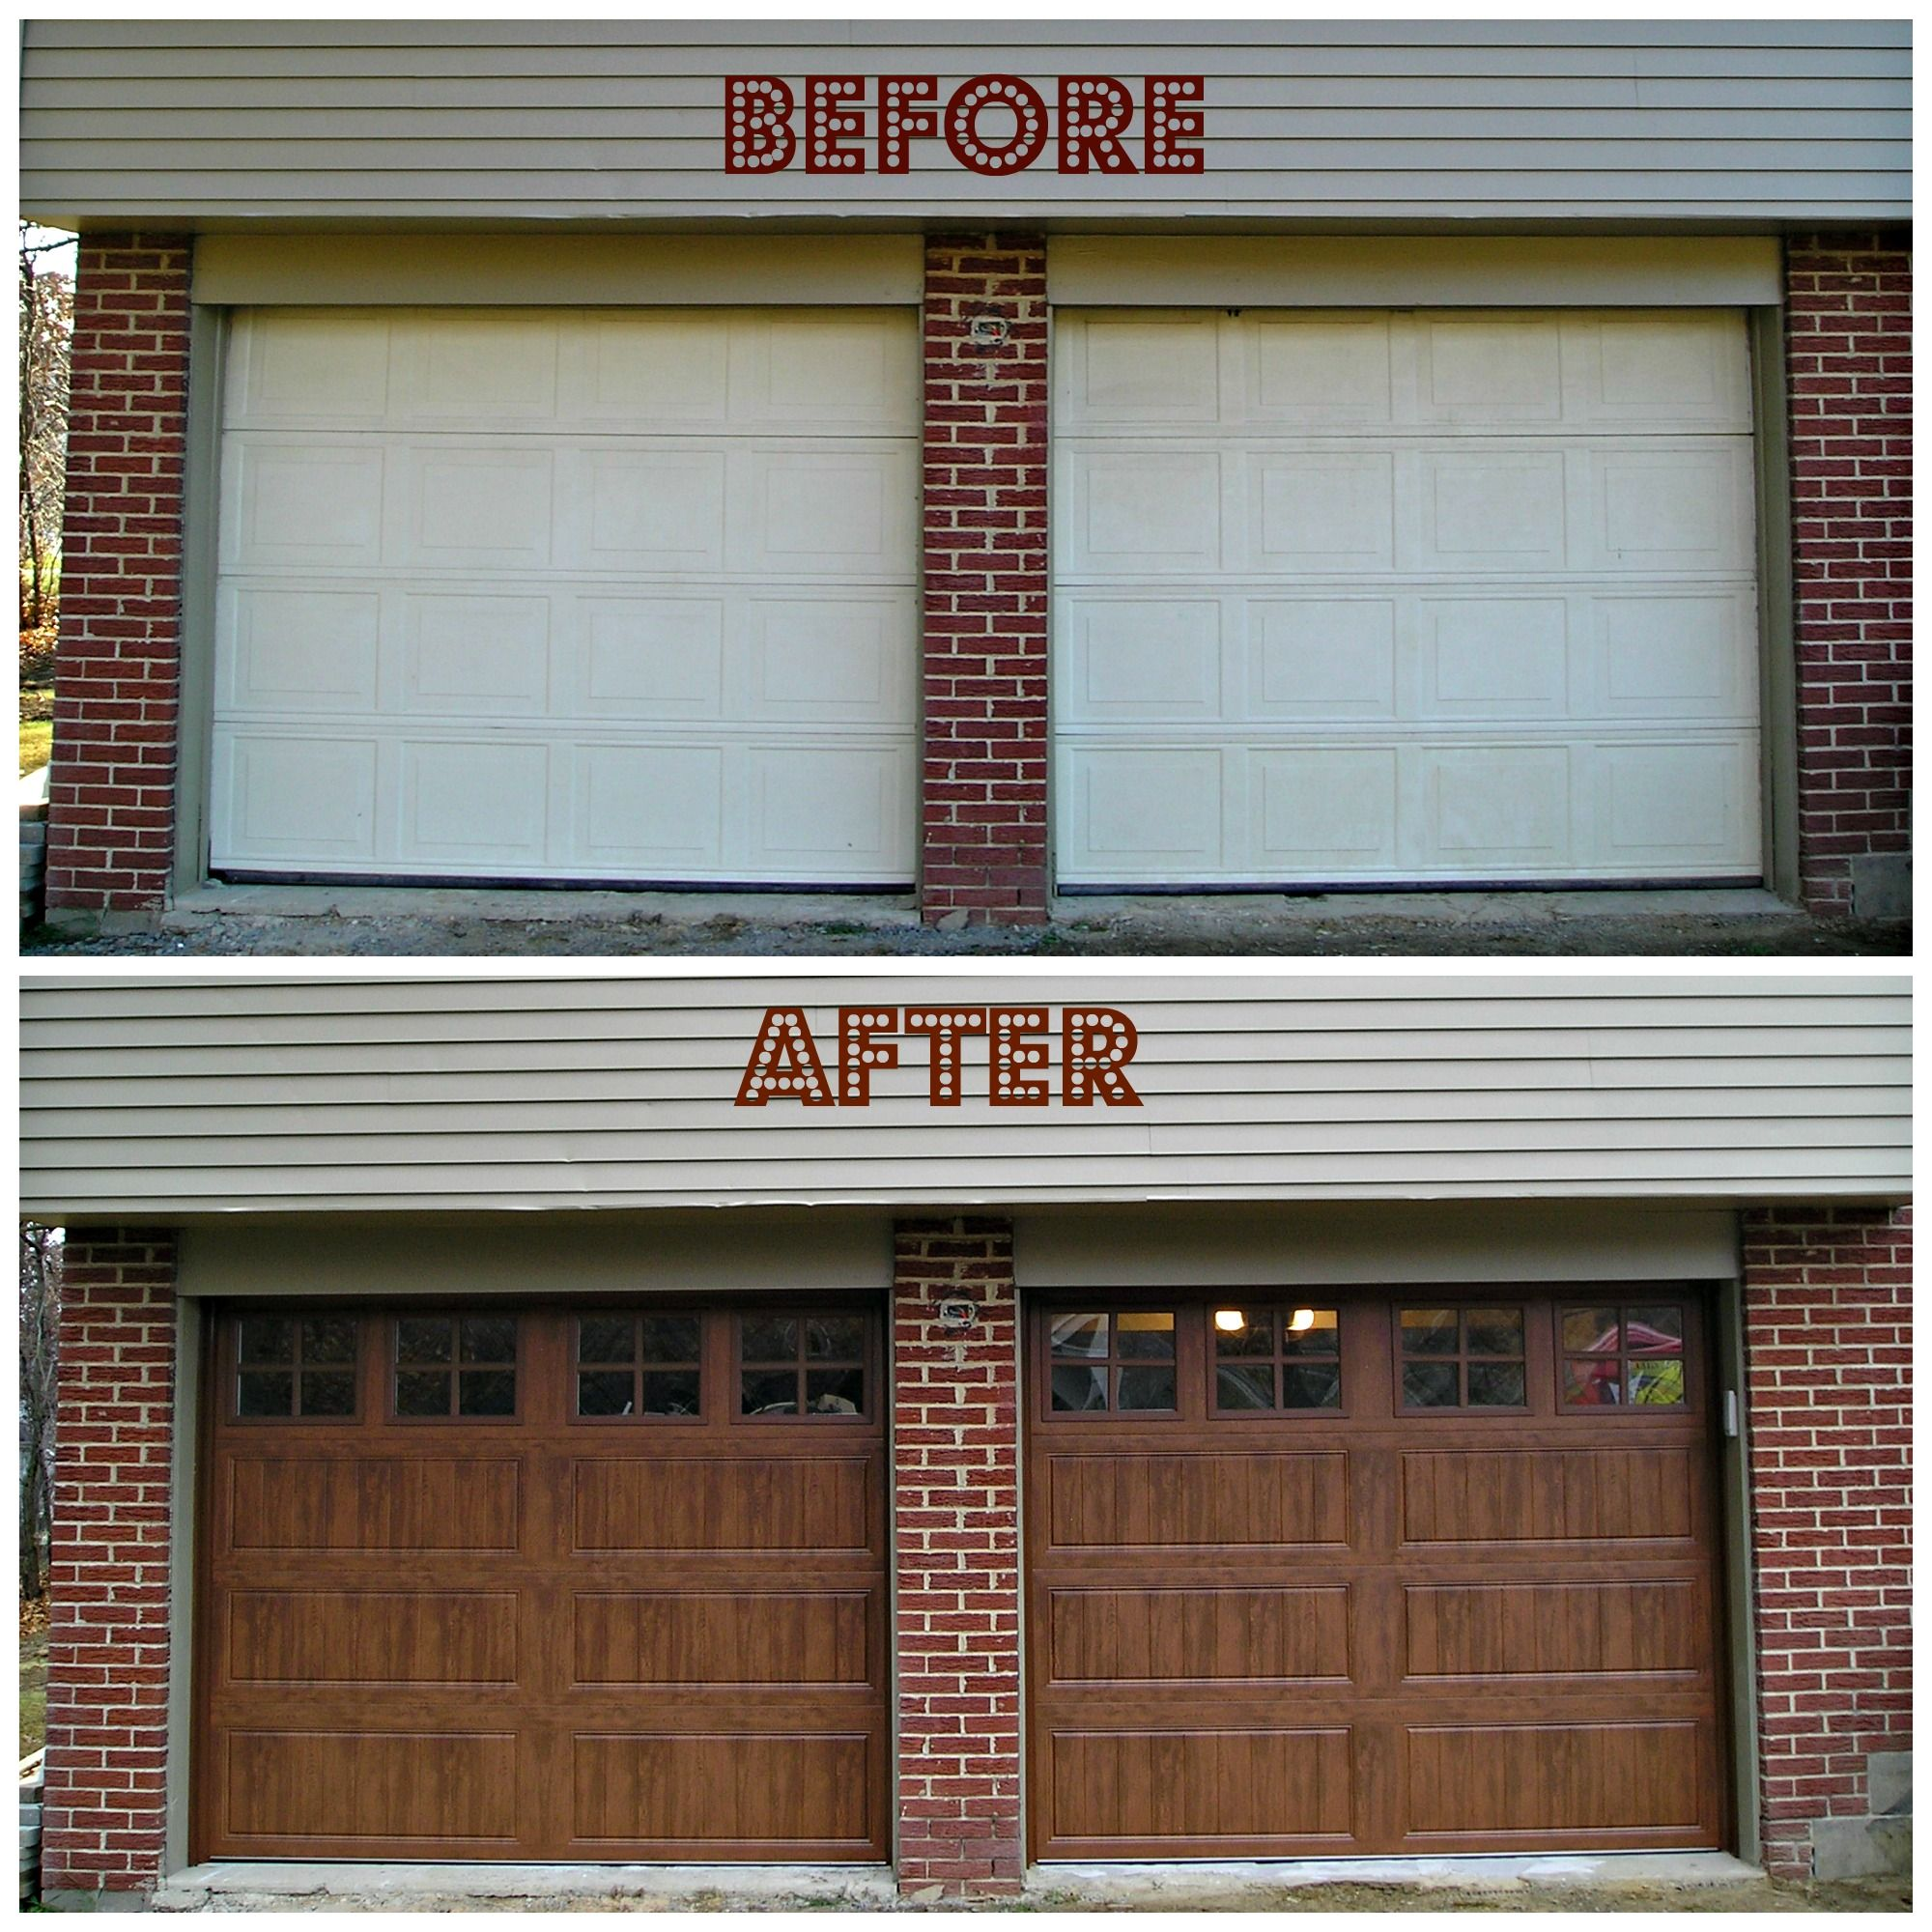 Thomas V Giel Garage Doors Installed A New Clopay Ultra